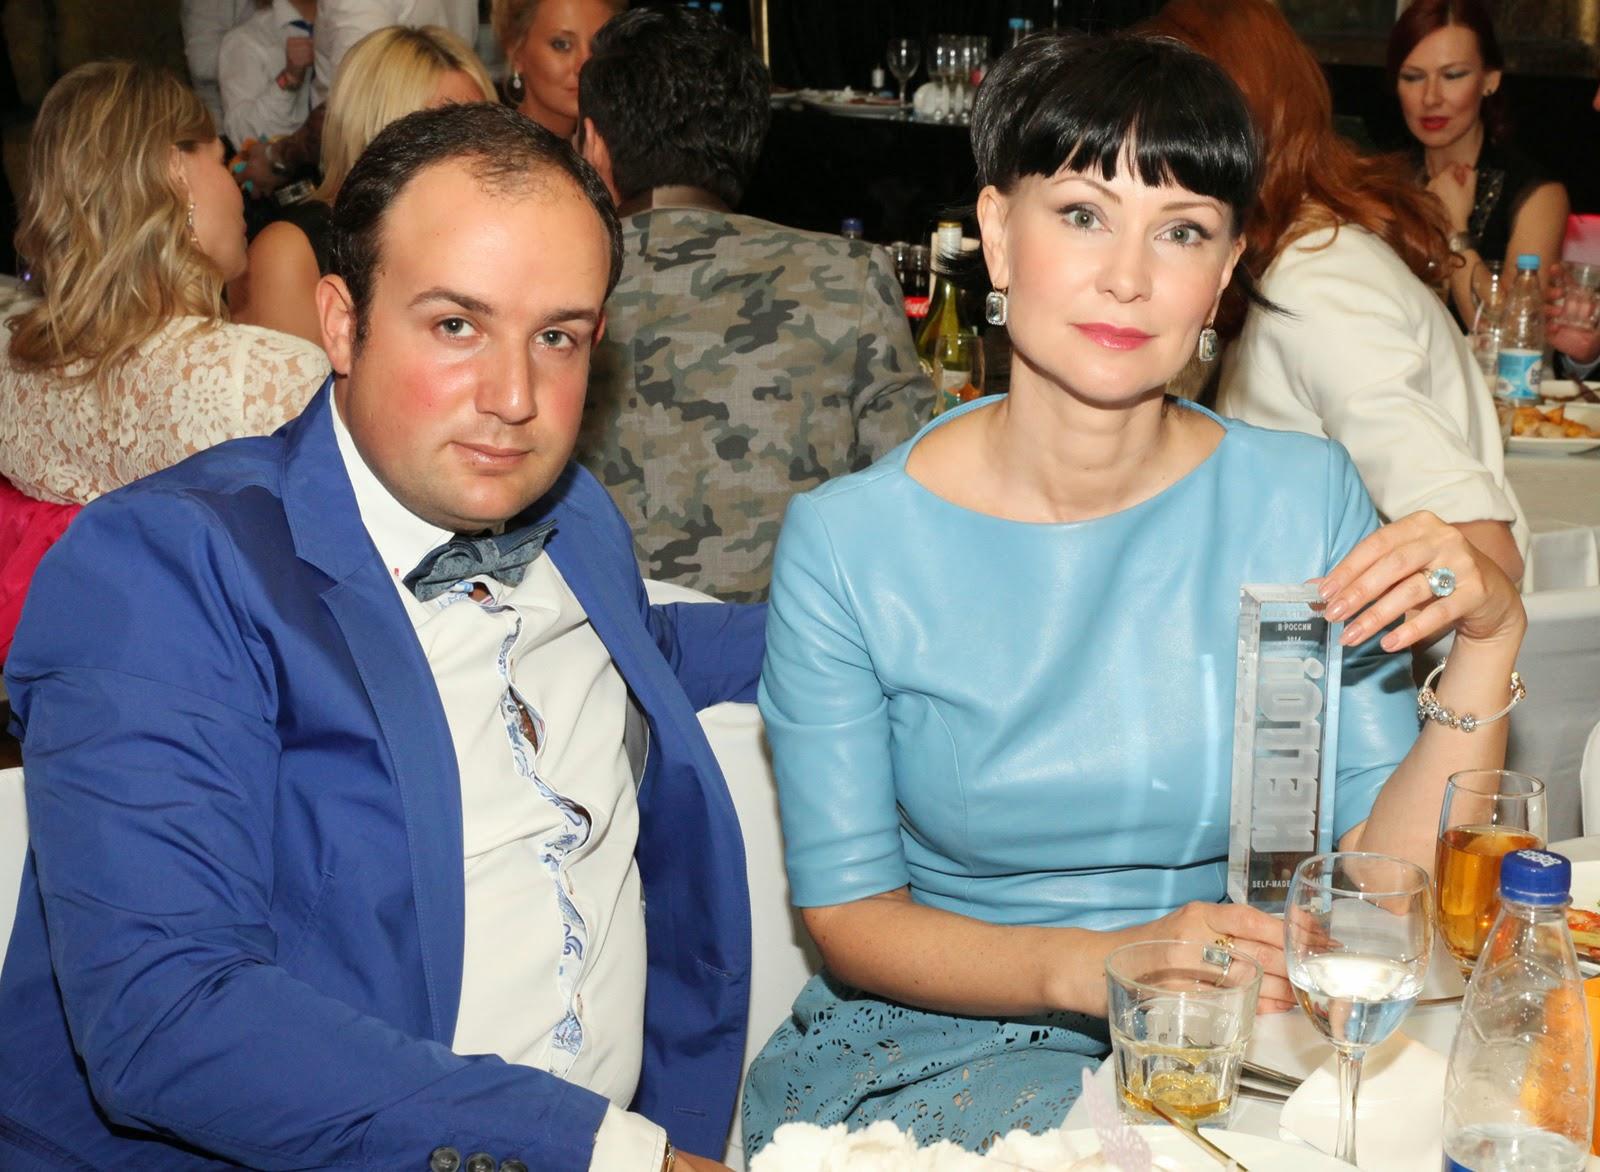 Ольга Дроздова: «Дима нагулял сына с соседкой» | StarHit.ru